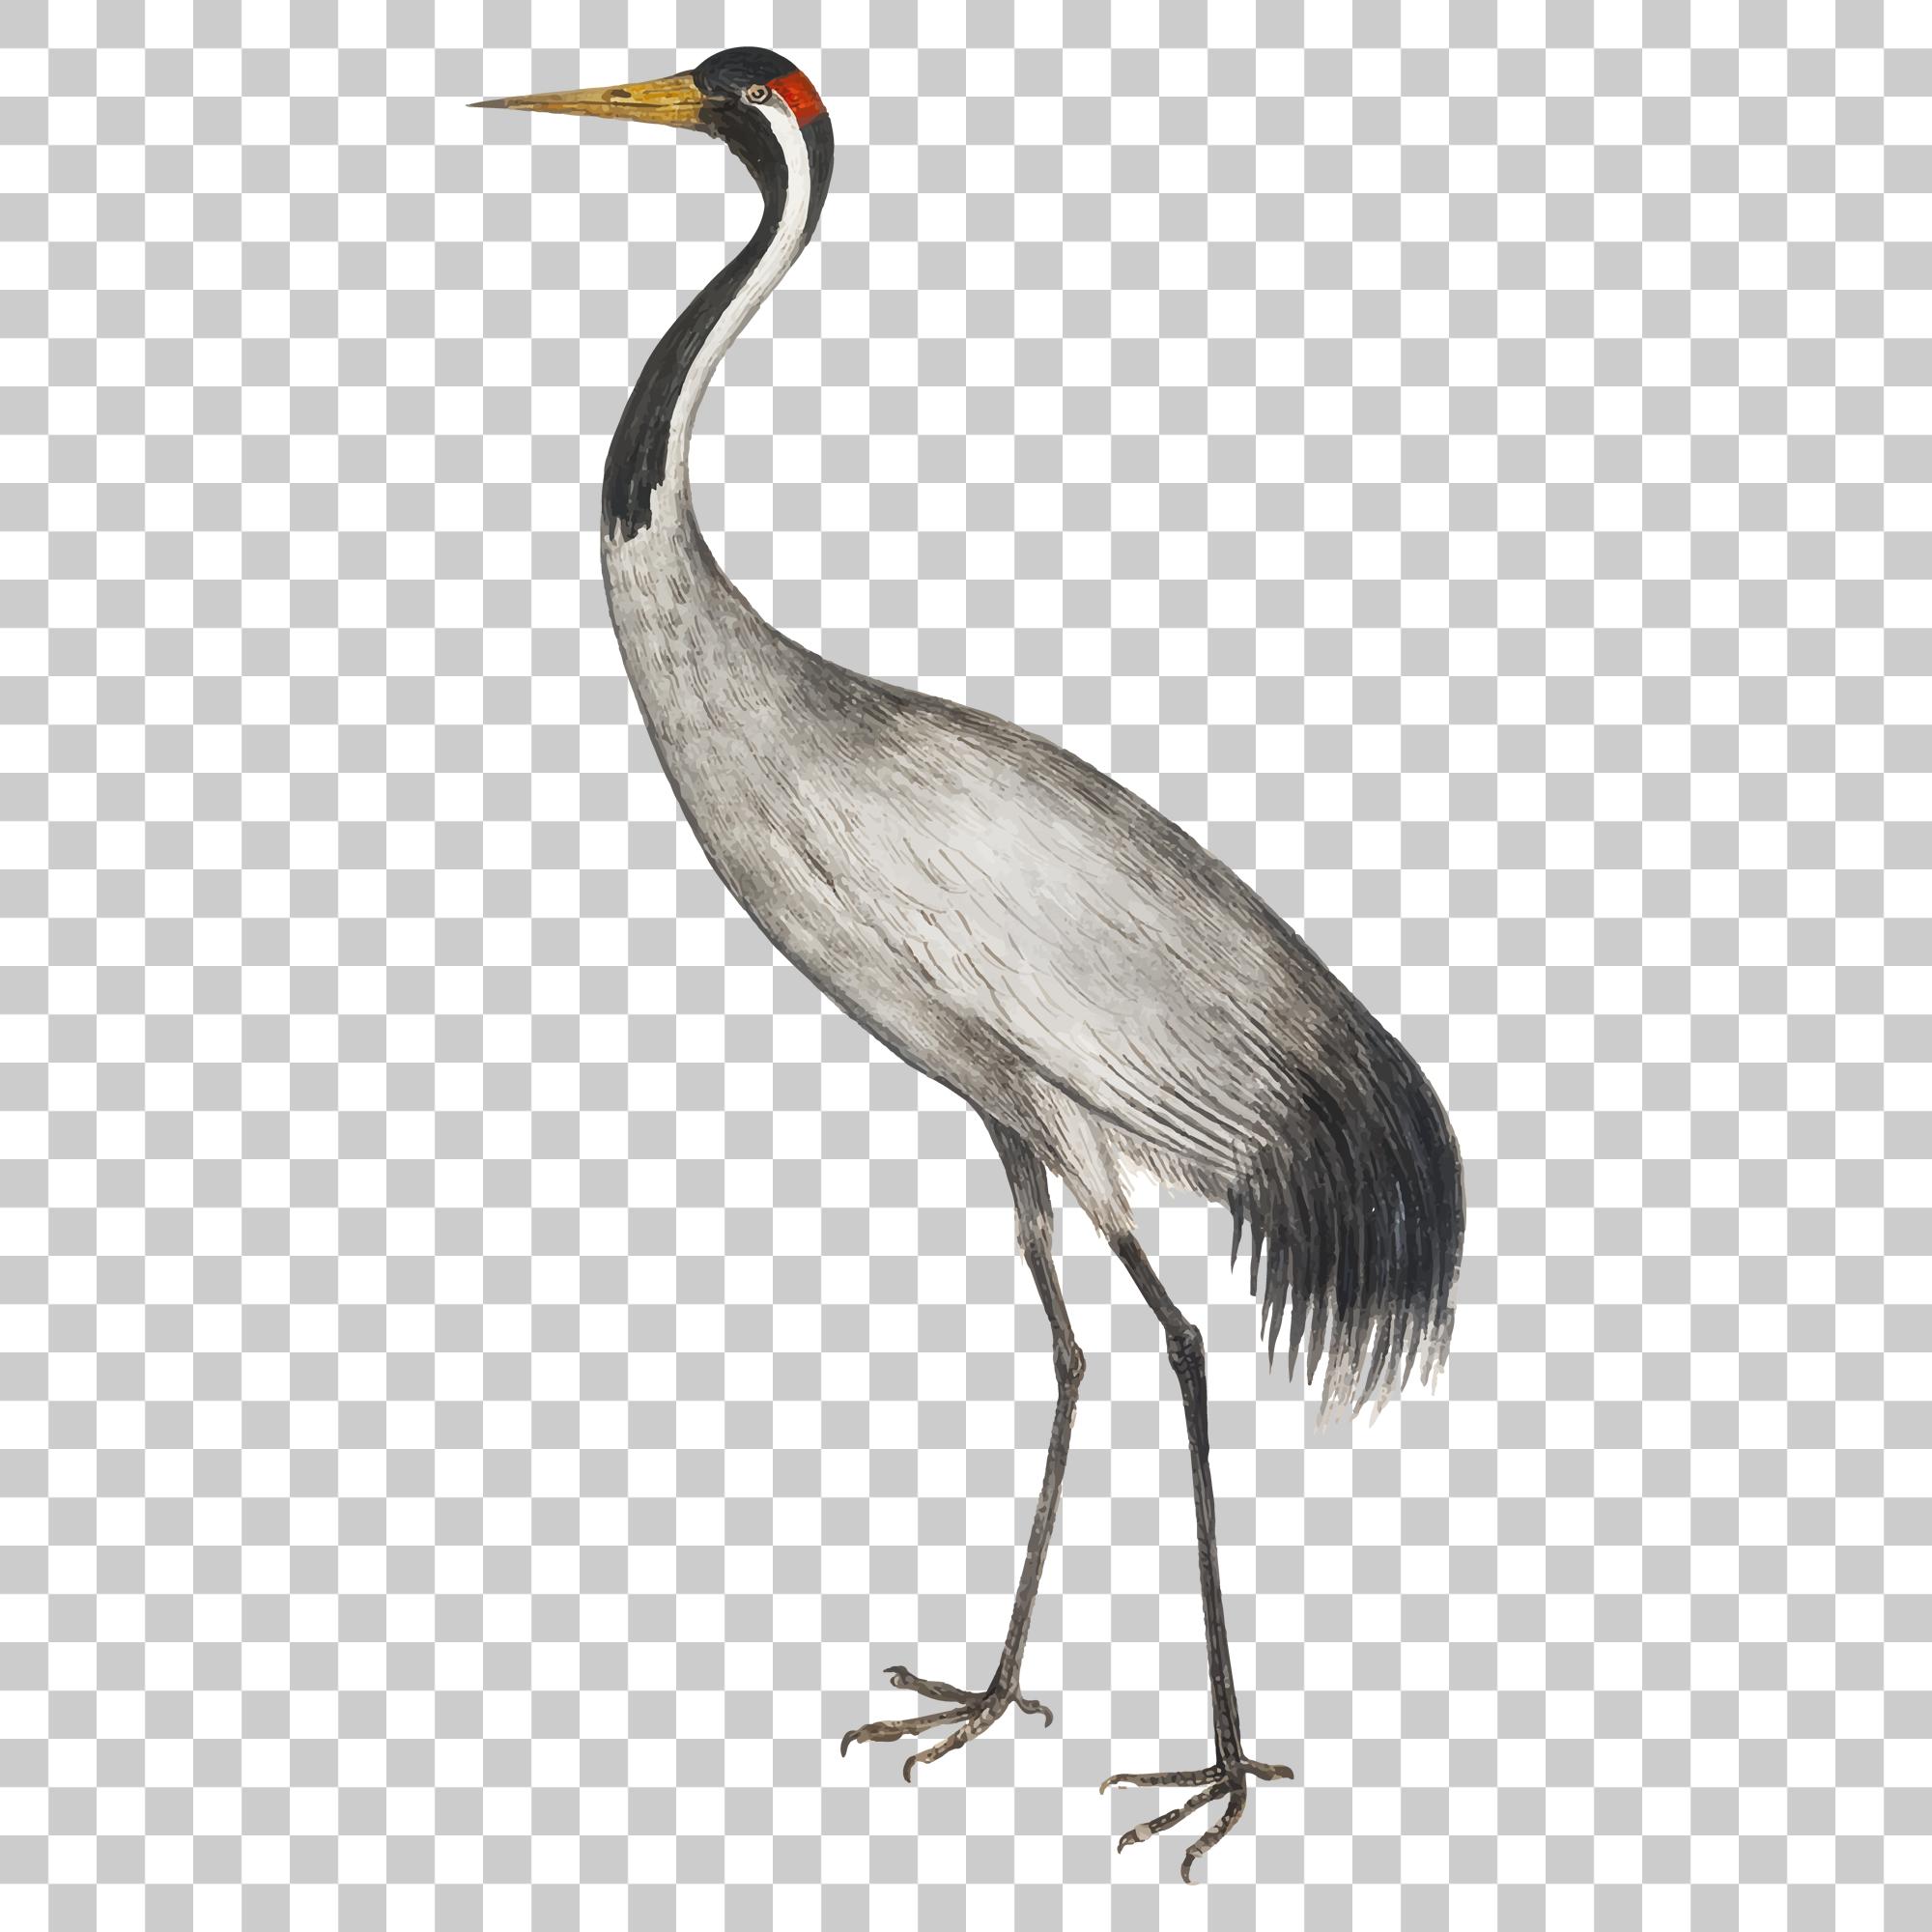 Crane Stork Bird Png Image With Transparent Background Bird Png Images Stork